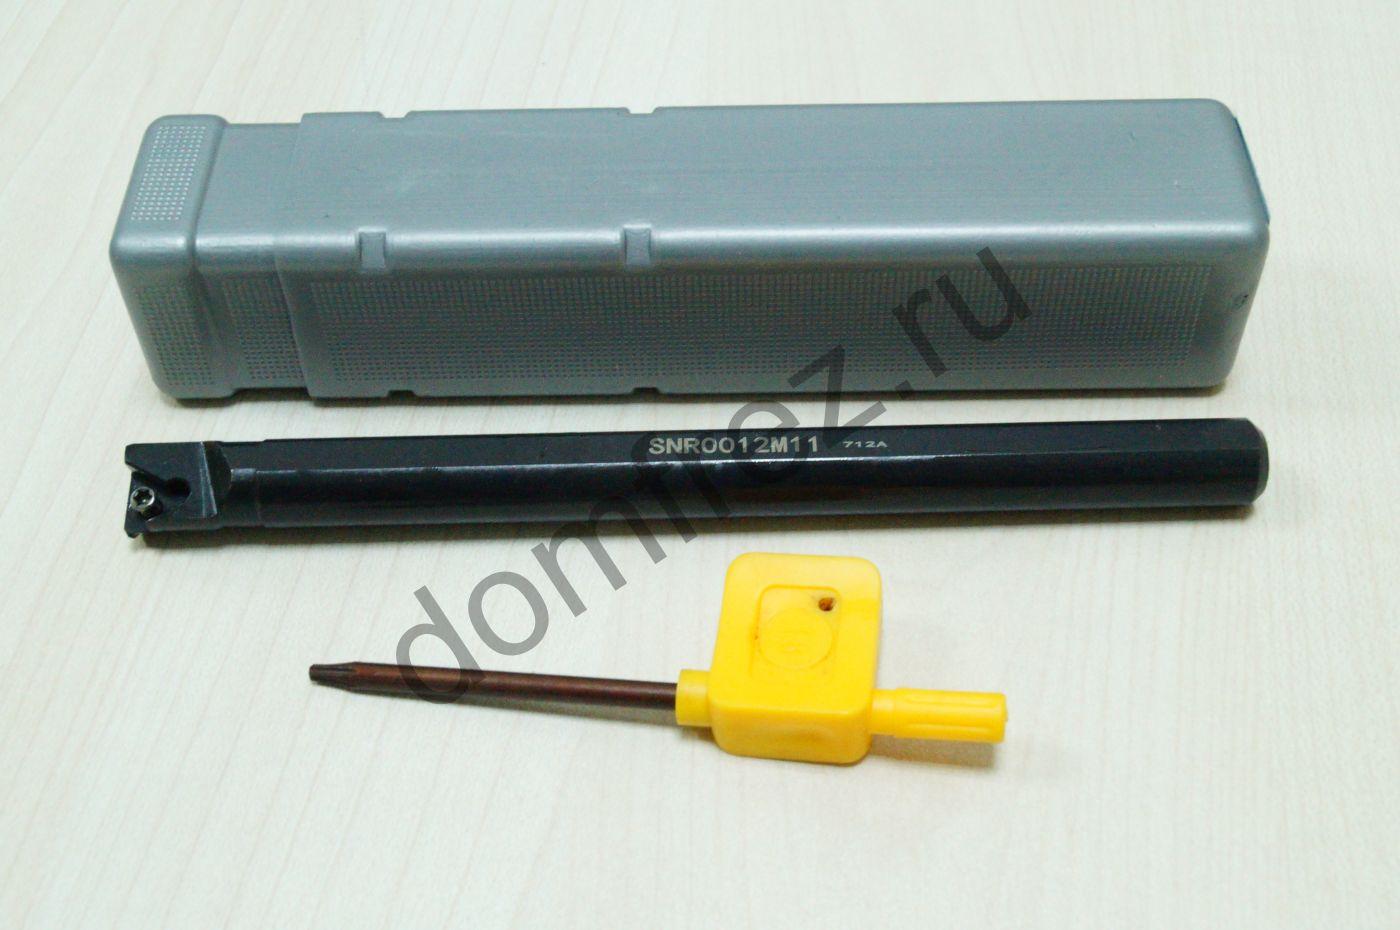 Державка SNR0012M11